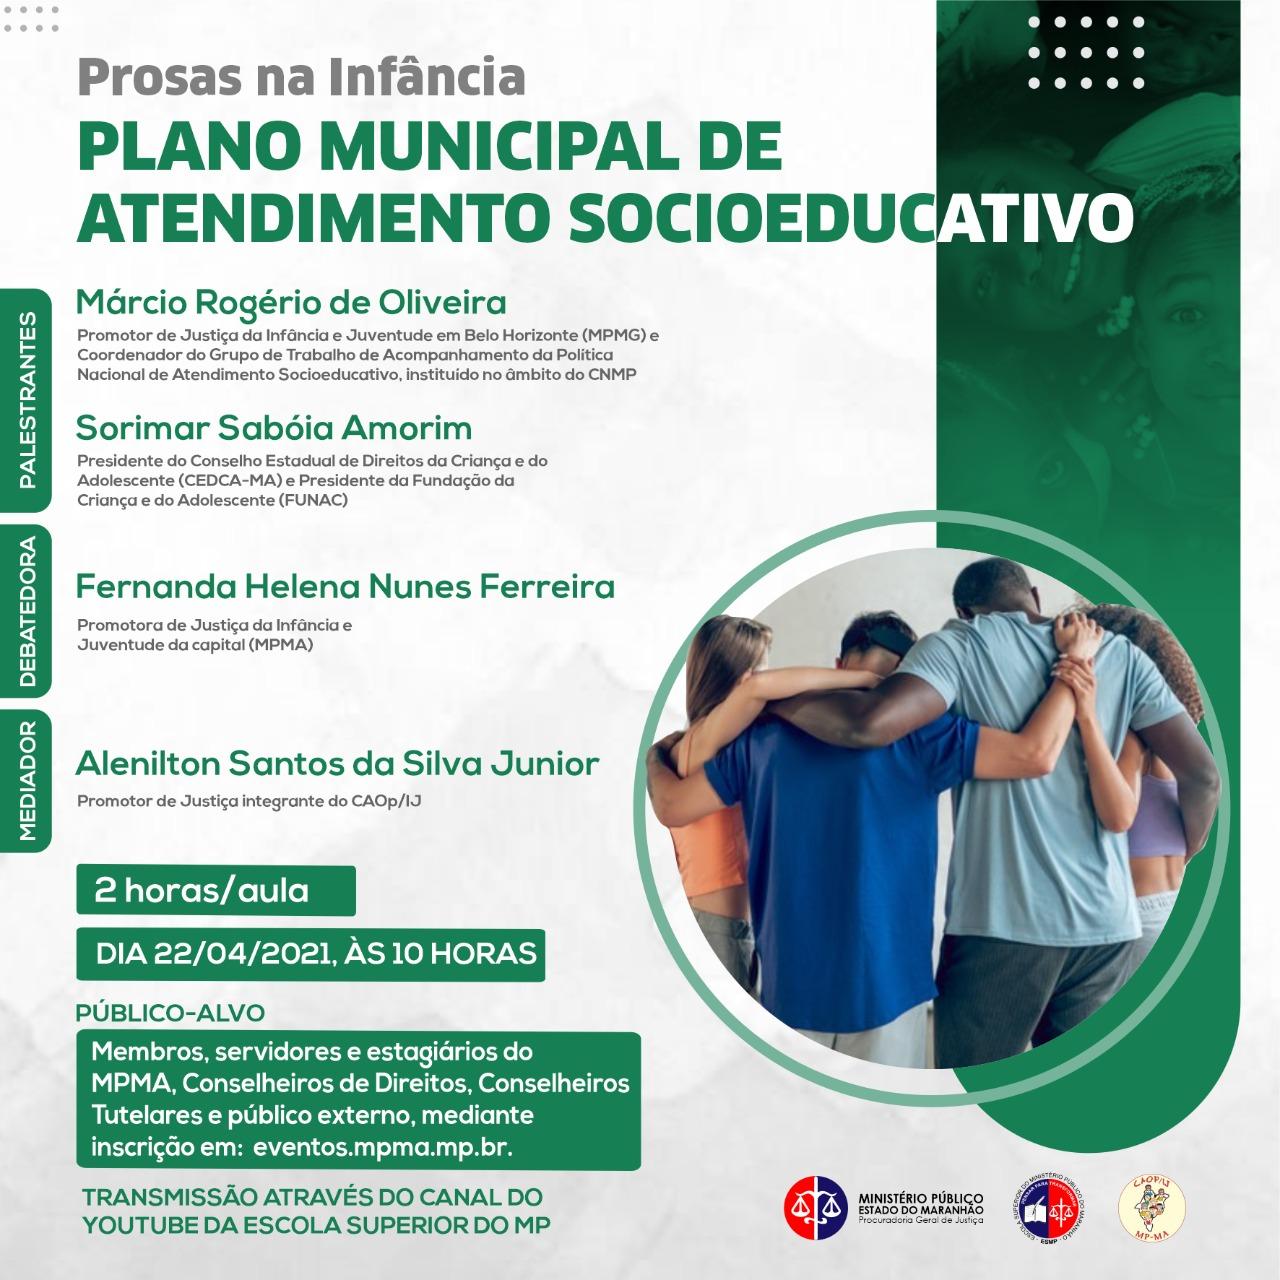 Prosas na Infância - Plano Municipal de Atendimento Socioeducativo